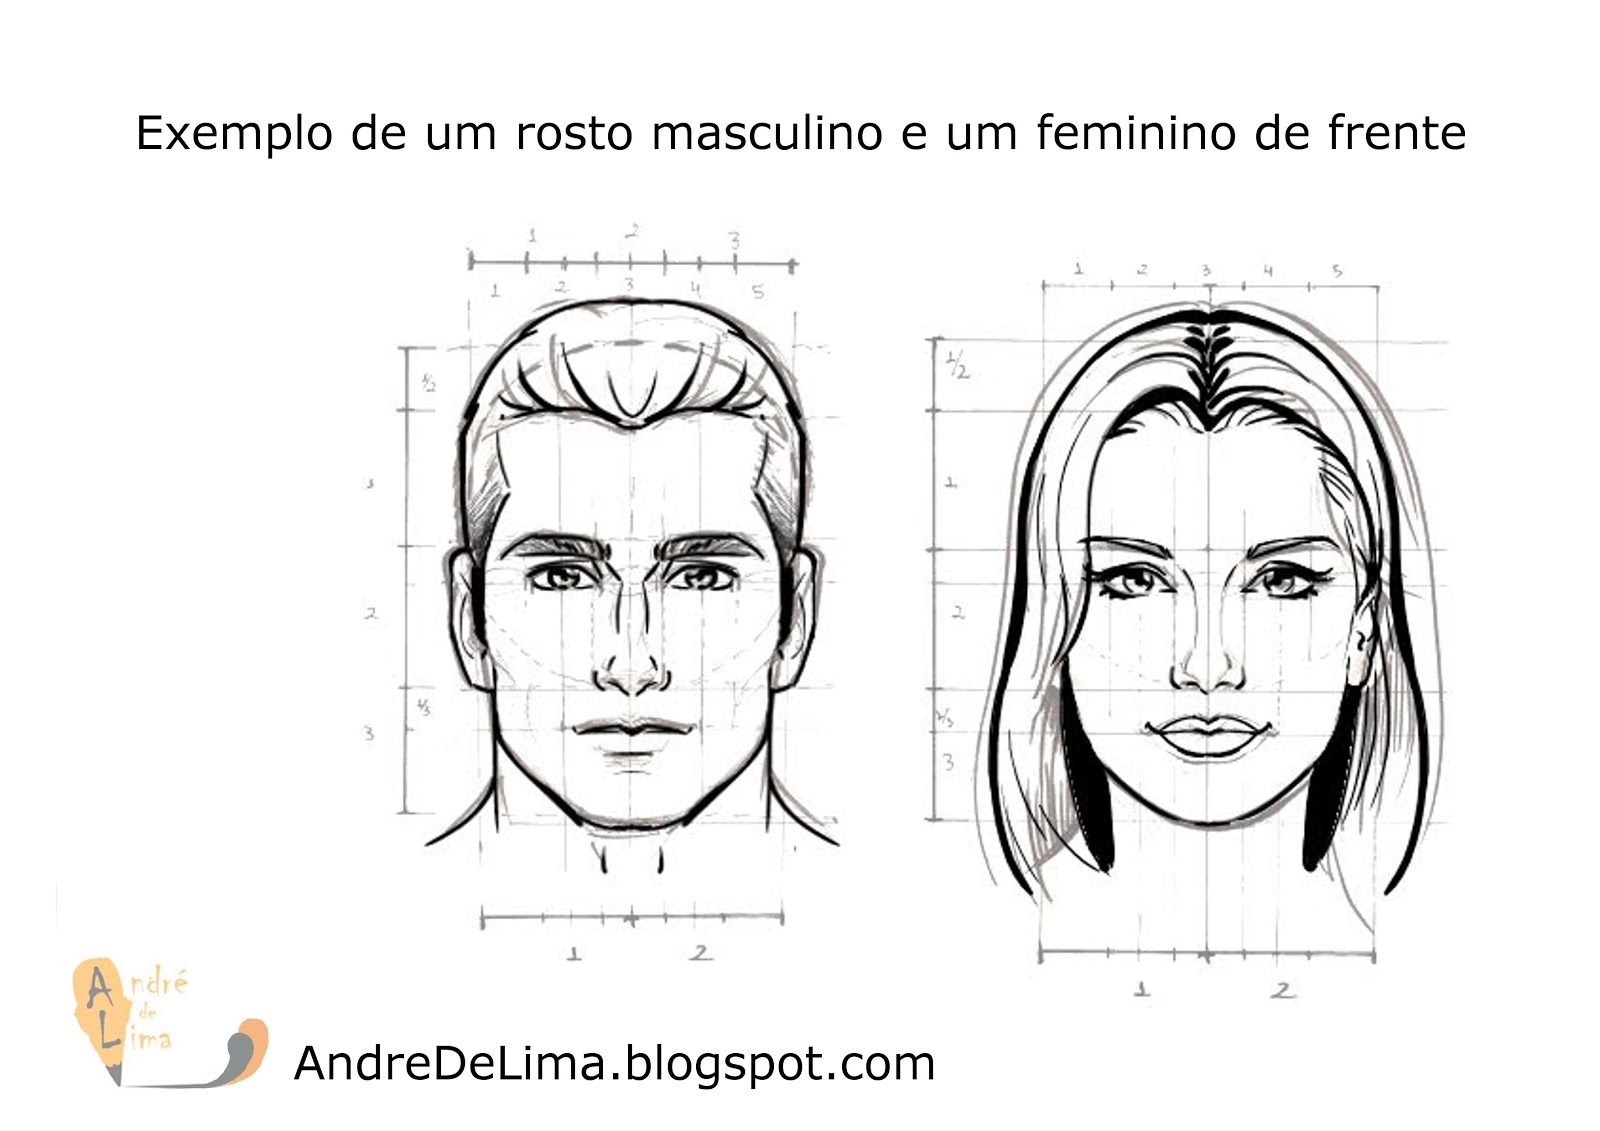 Andre De Lima Rc Alodesenhos Rosto Masculino E Feminino 1